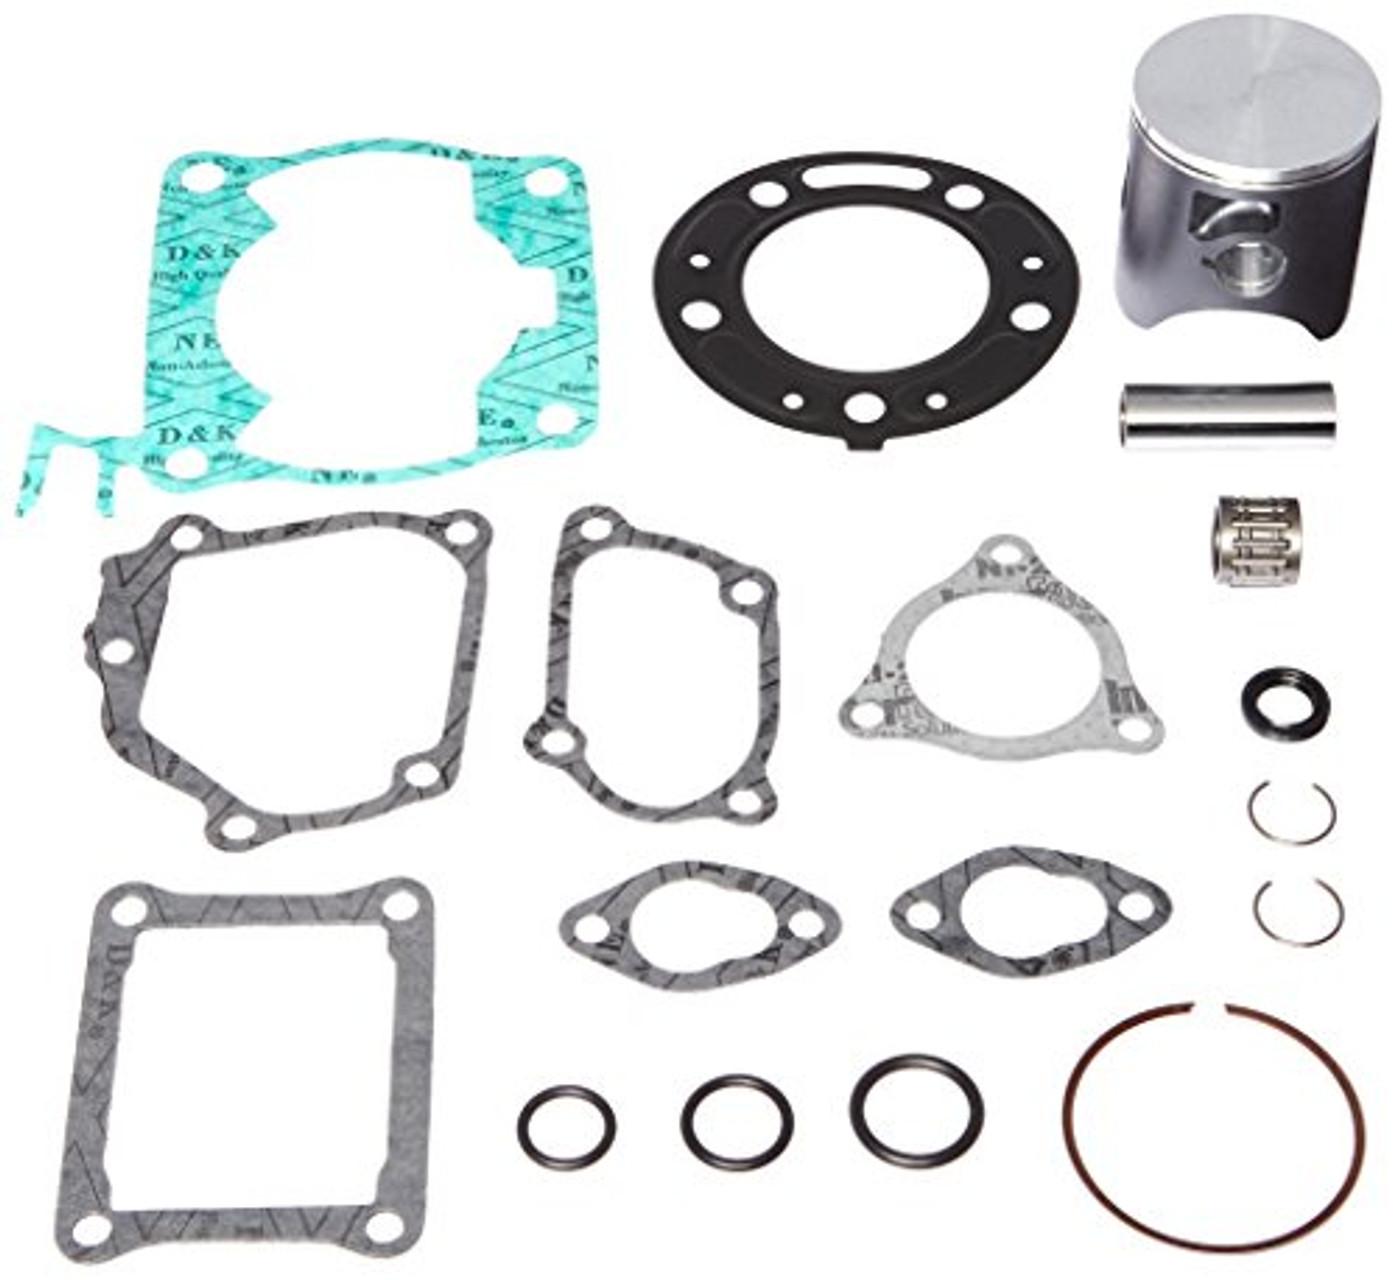 Vertex VTK22685C Replica Top End Piston Kit